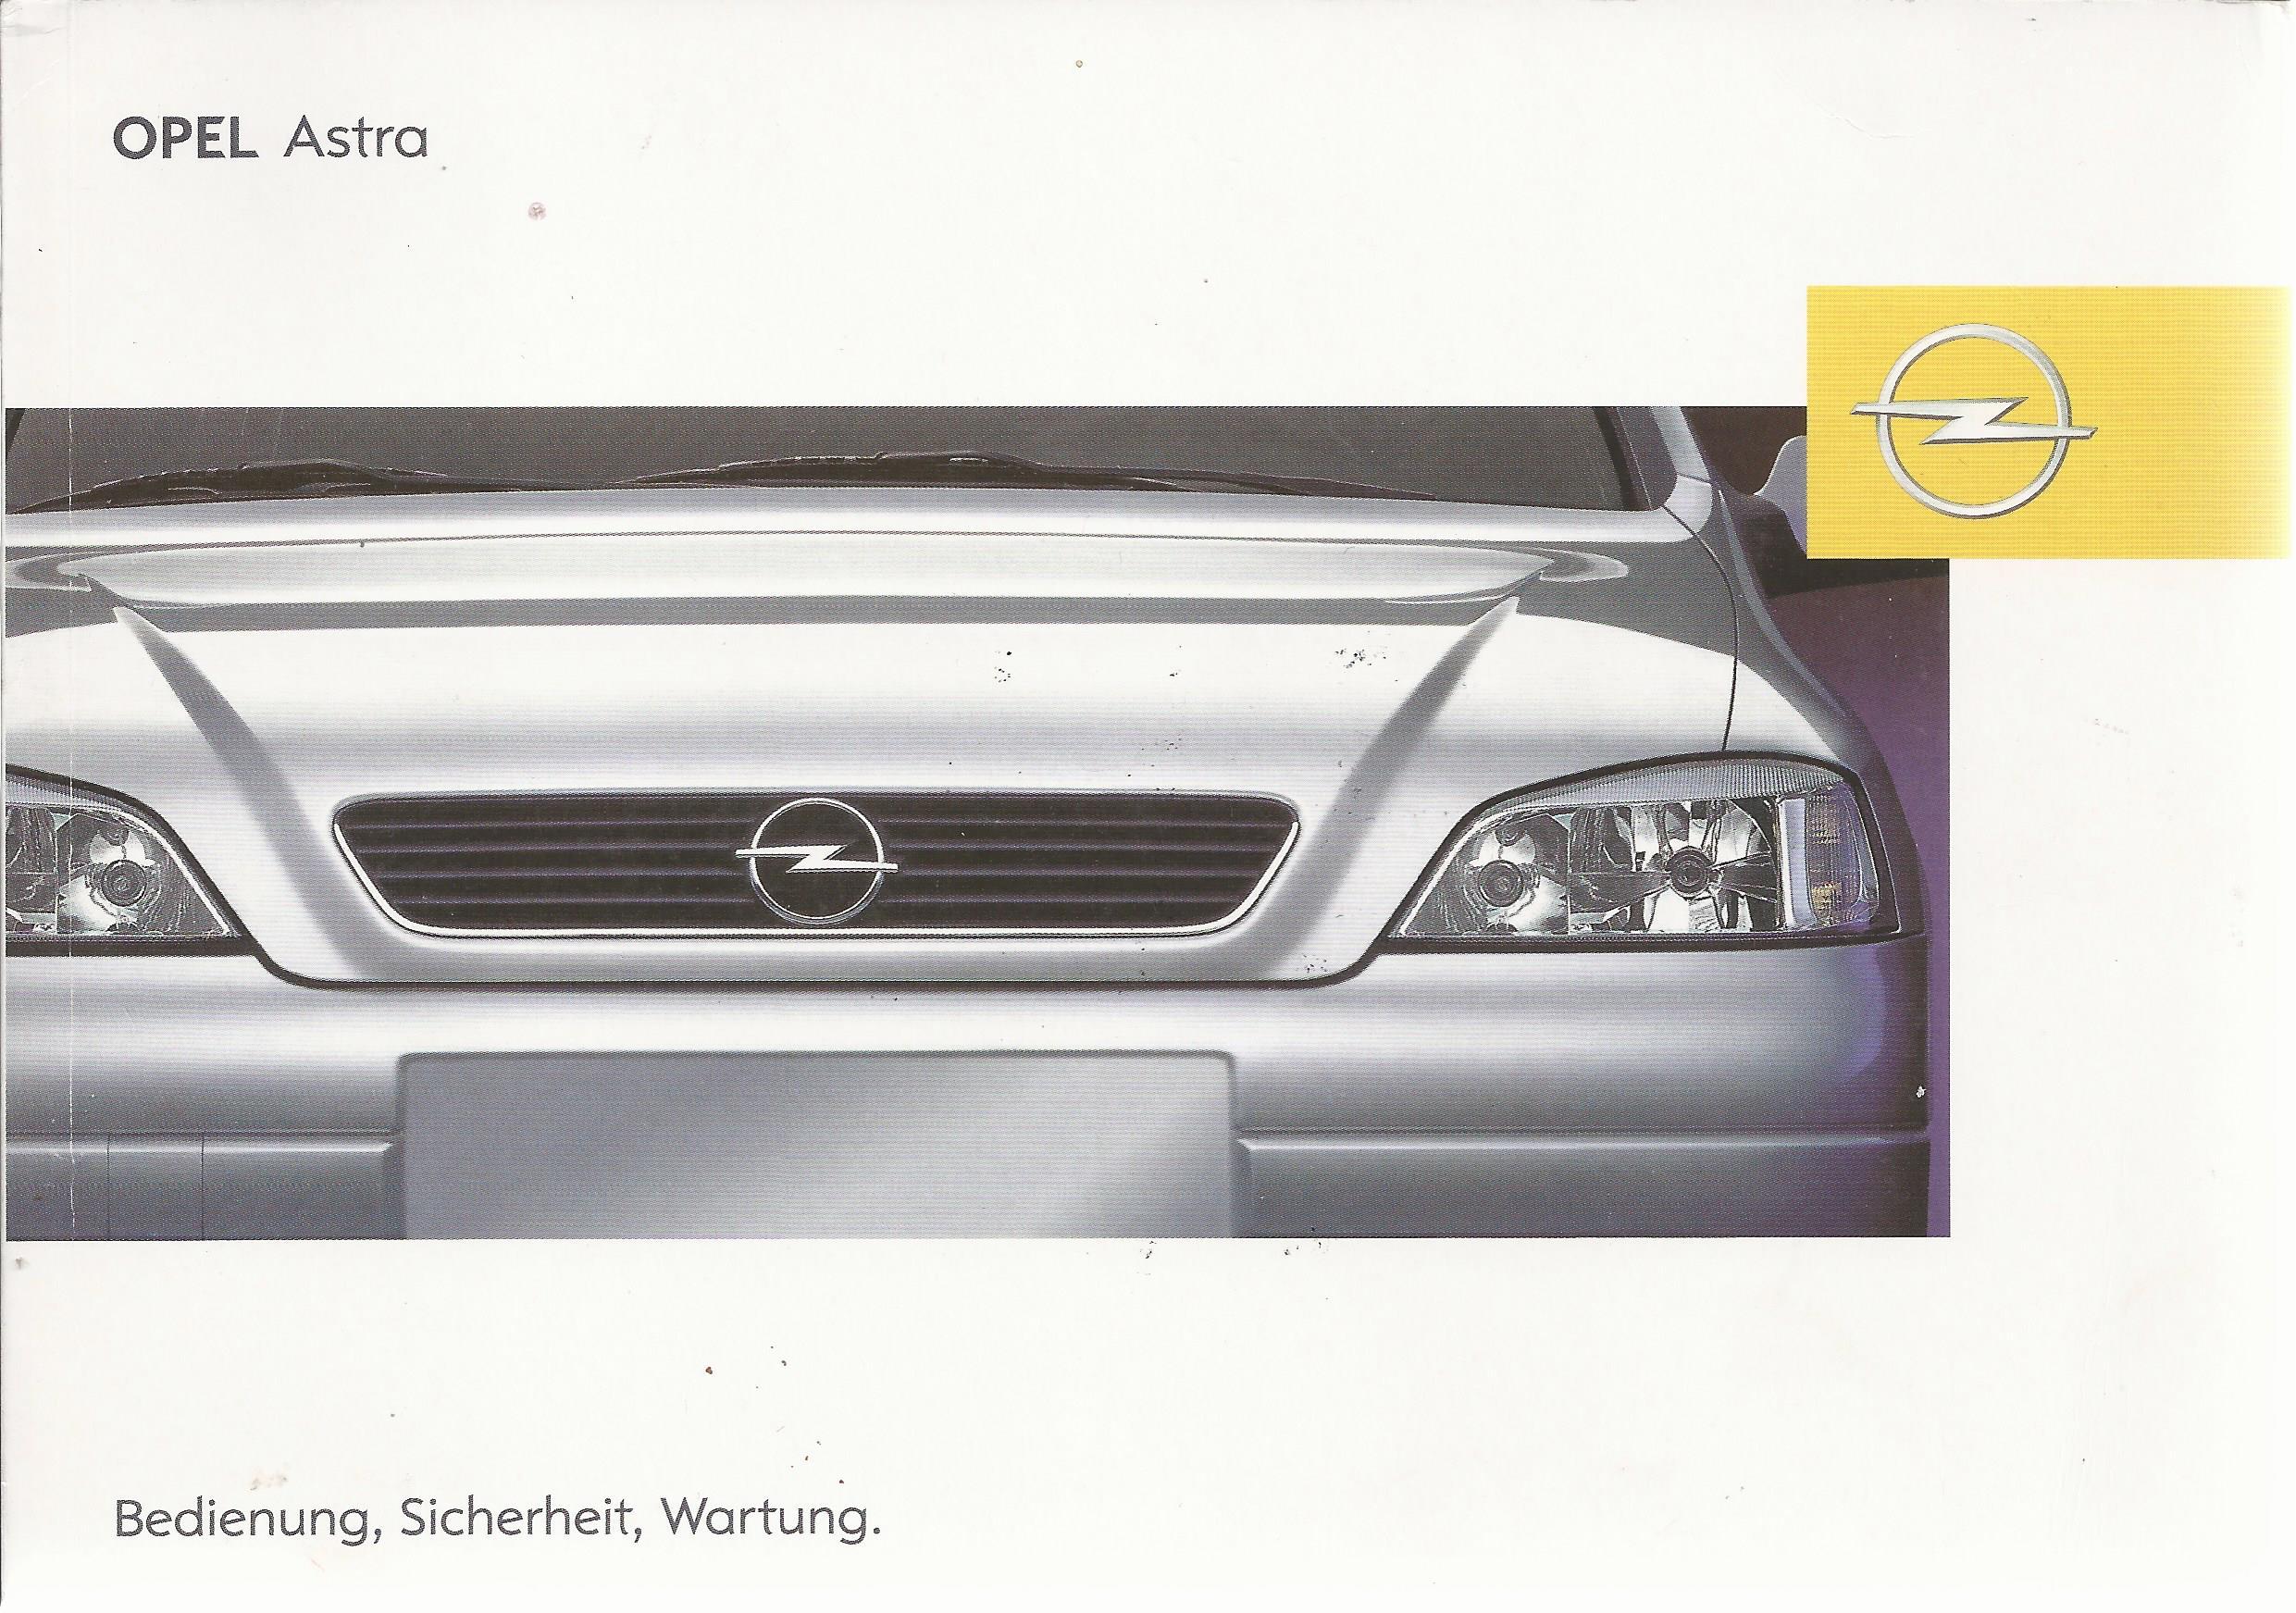 opel astra cabrio coupe g betriebsanleitung 2002 bedienungsanleitung ba ebay. Black Bedroom Furniture Sets. Home Design Ideas